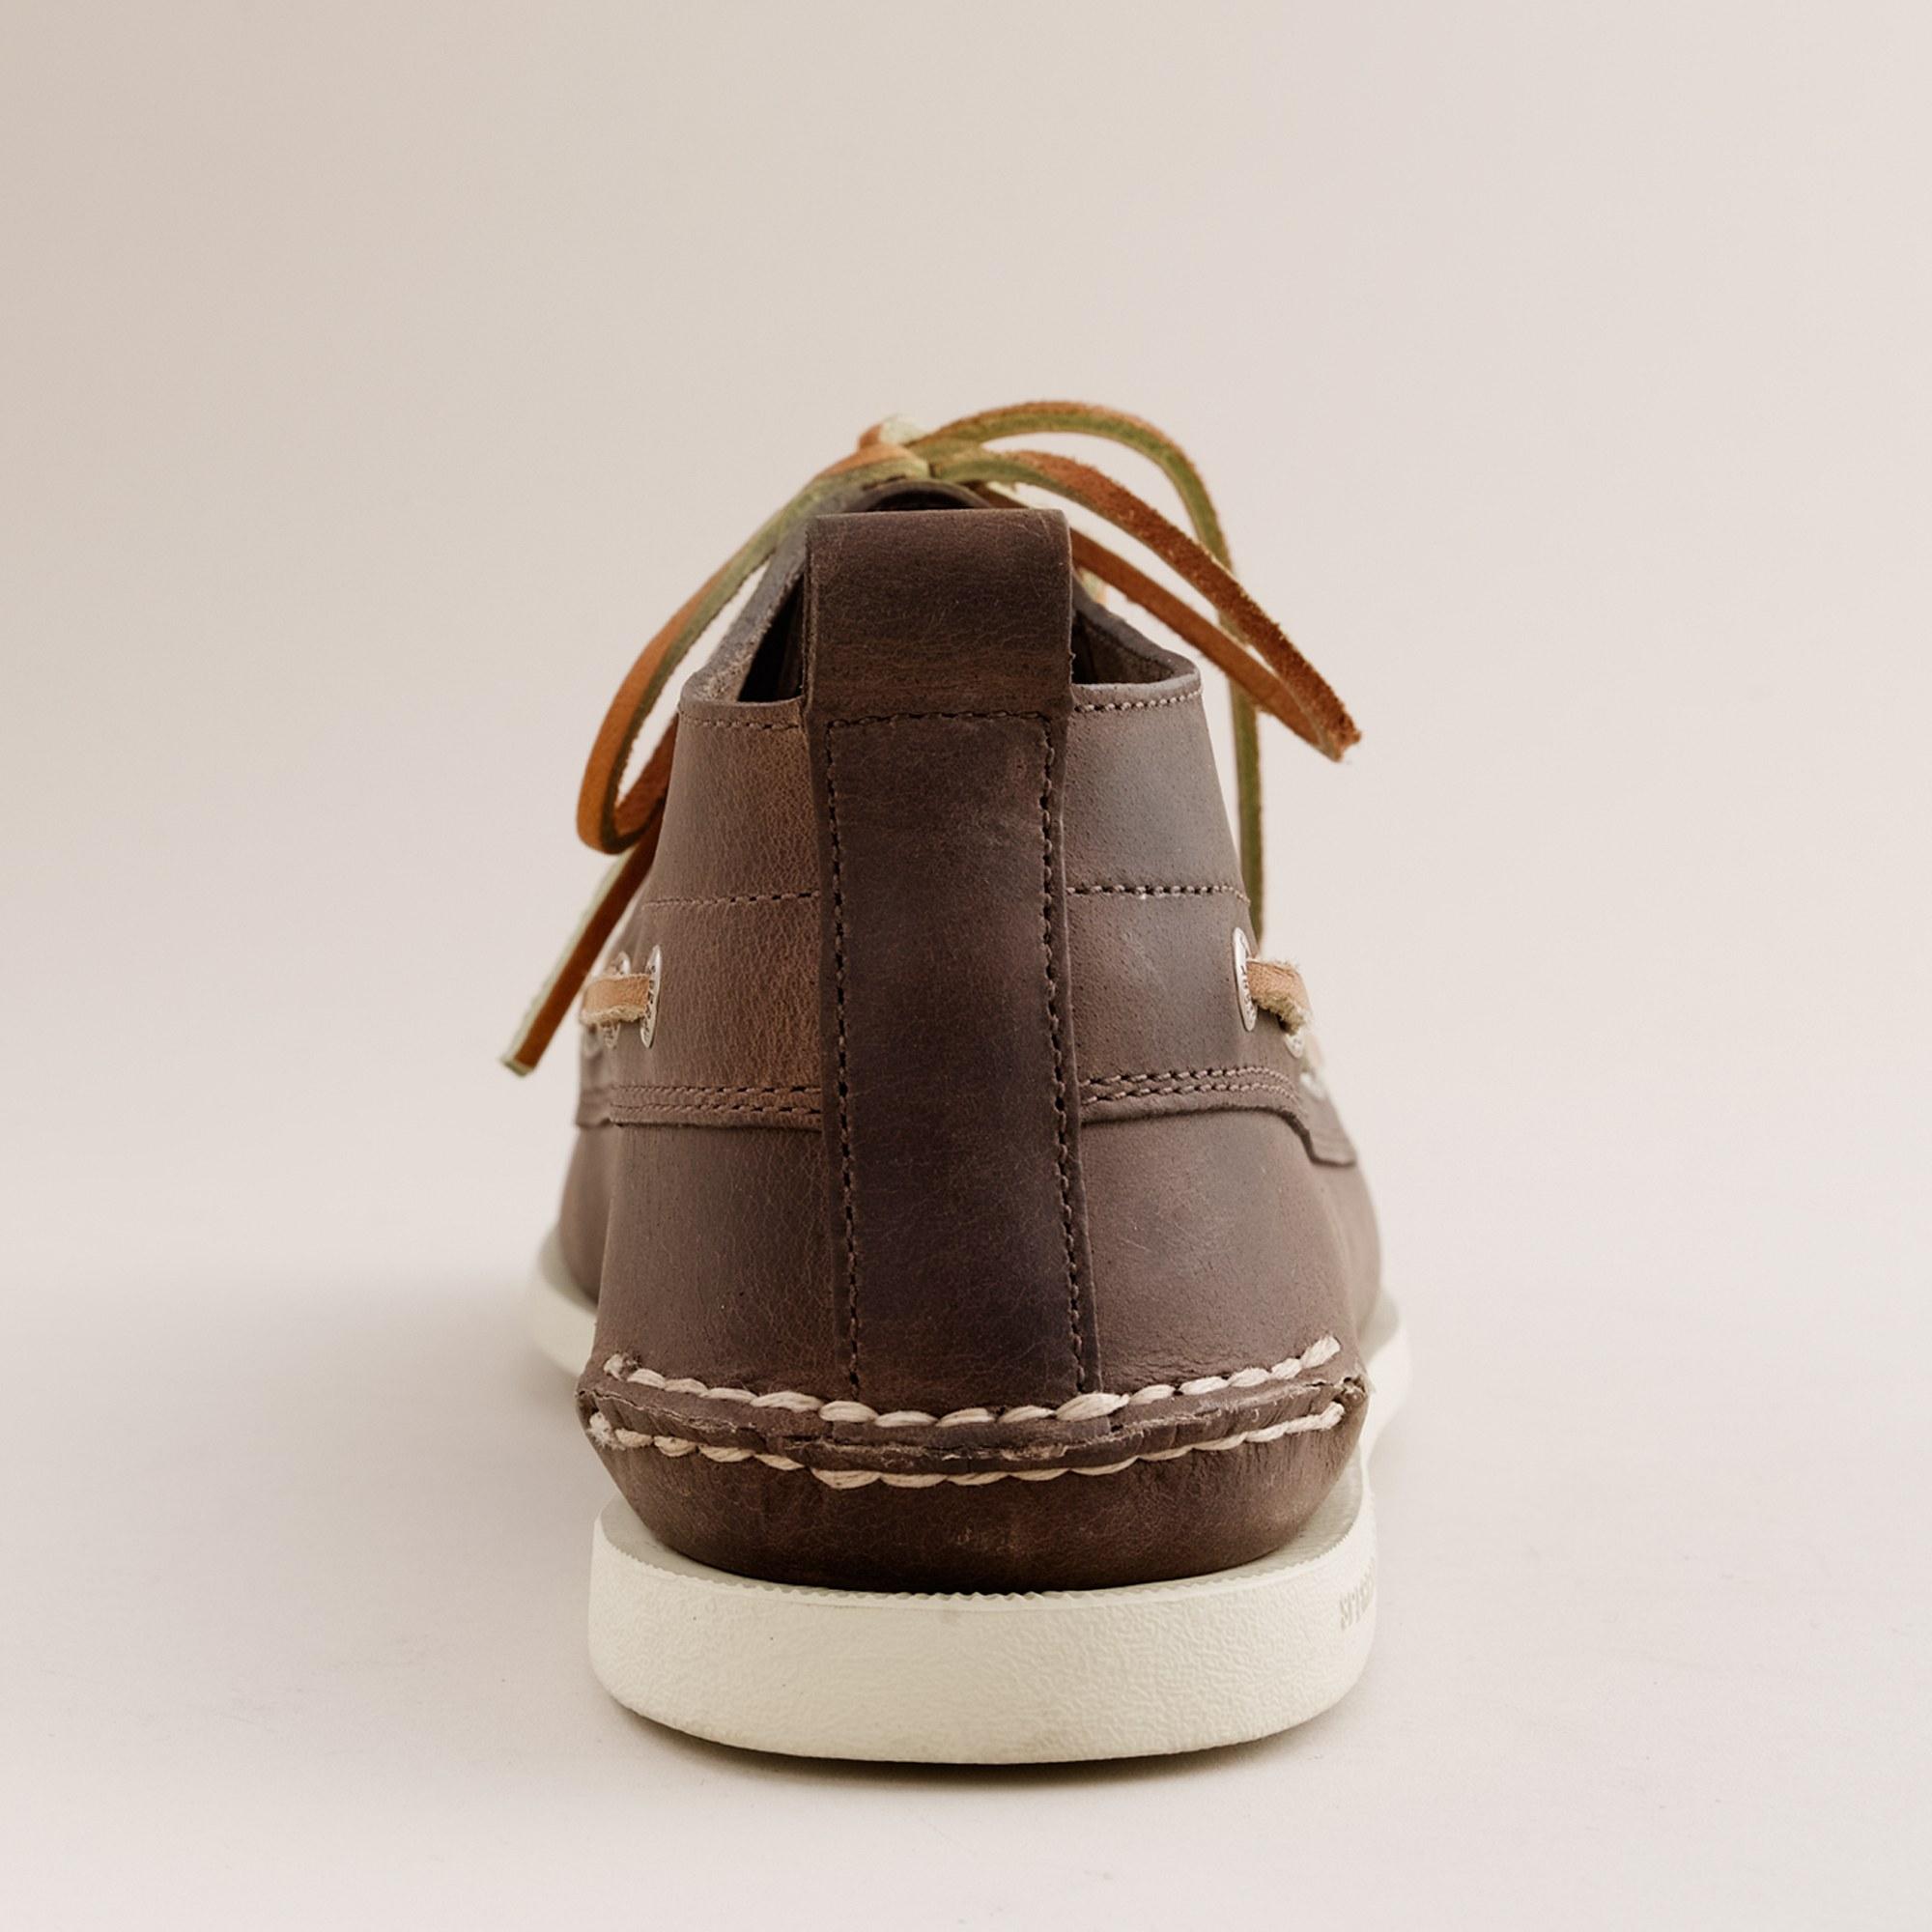 338840ec07 Lyst J Crew Sperry Top Sider Authentic Original Leather Chukka